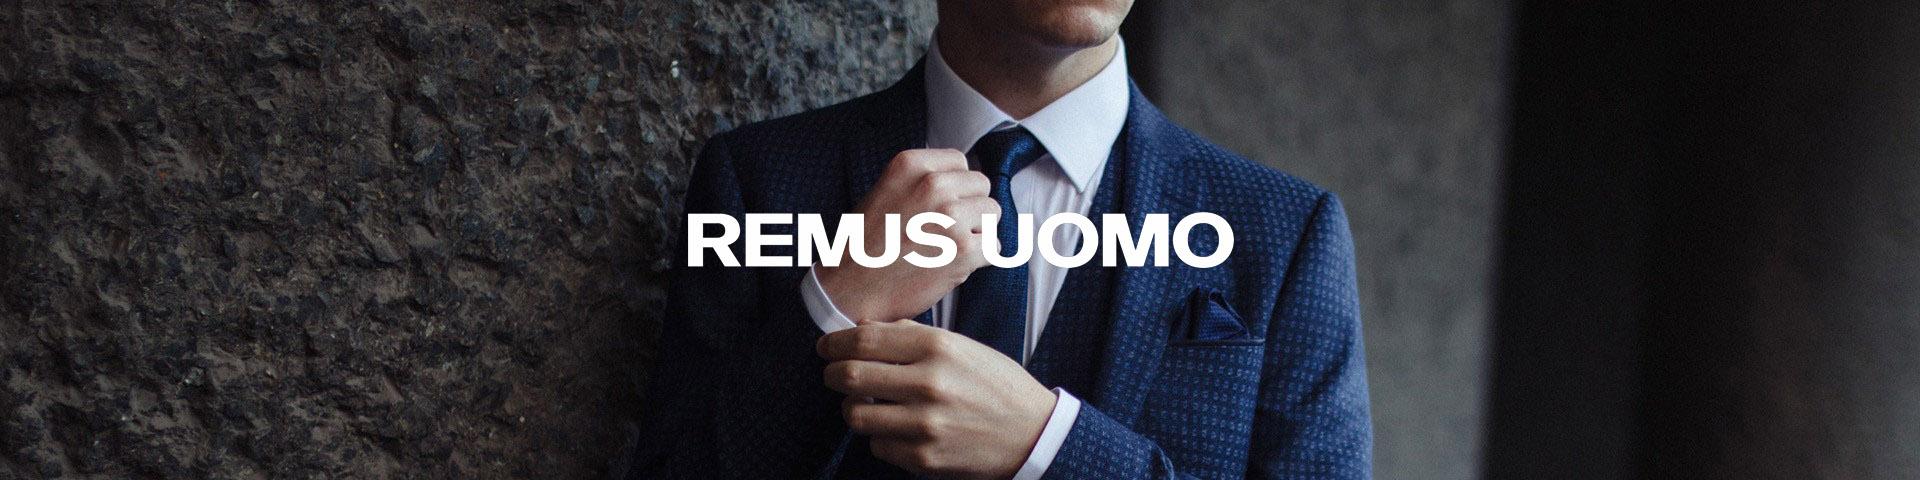 remus-revsl-1920